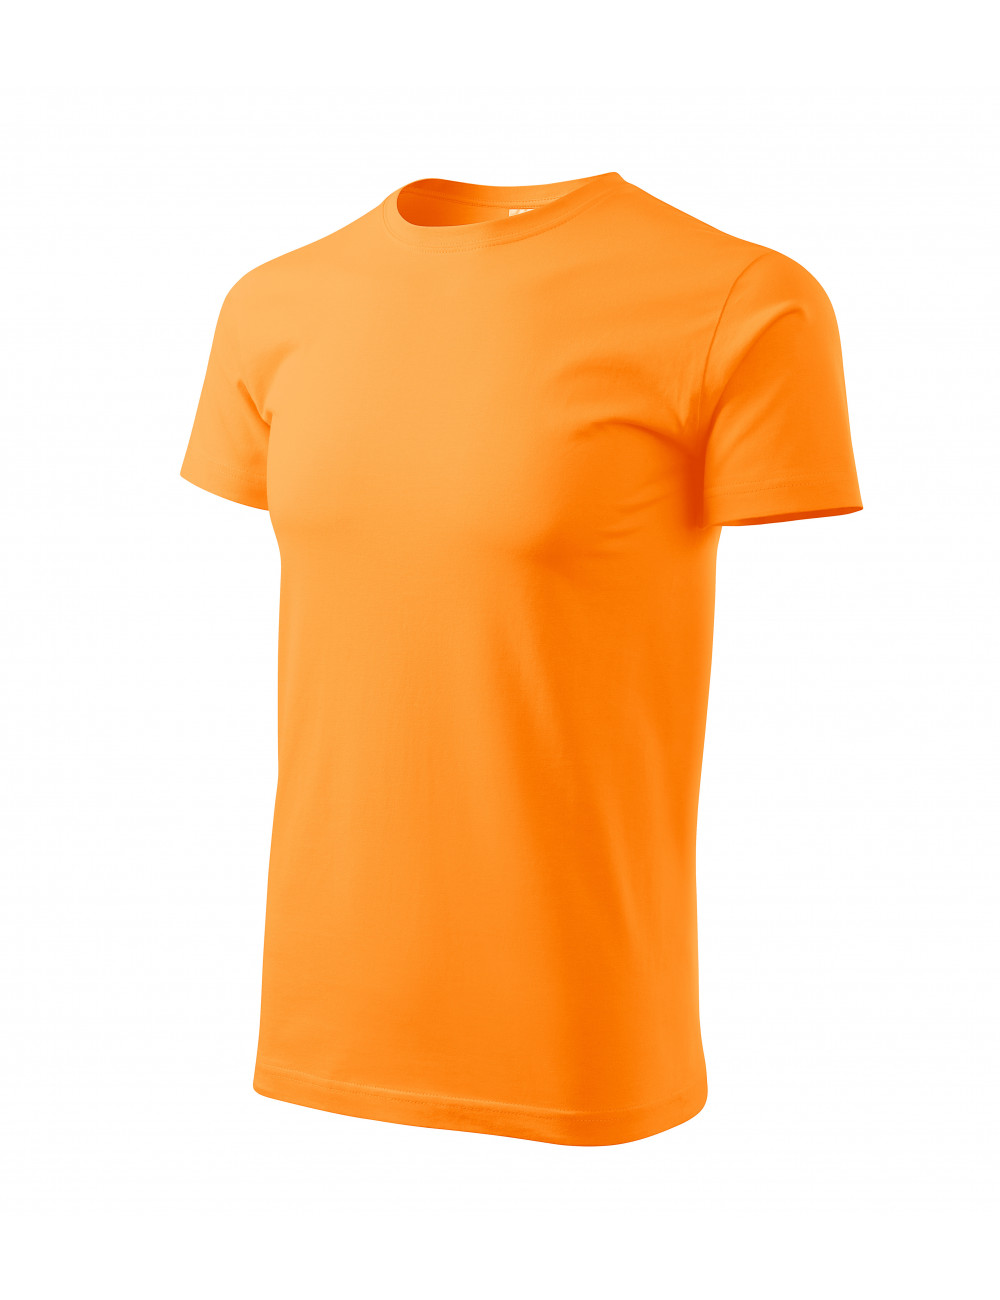 Adler MALFINI Koszulka męska Basic 129 mandarynkowy